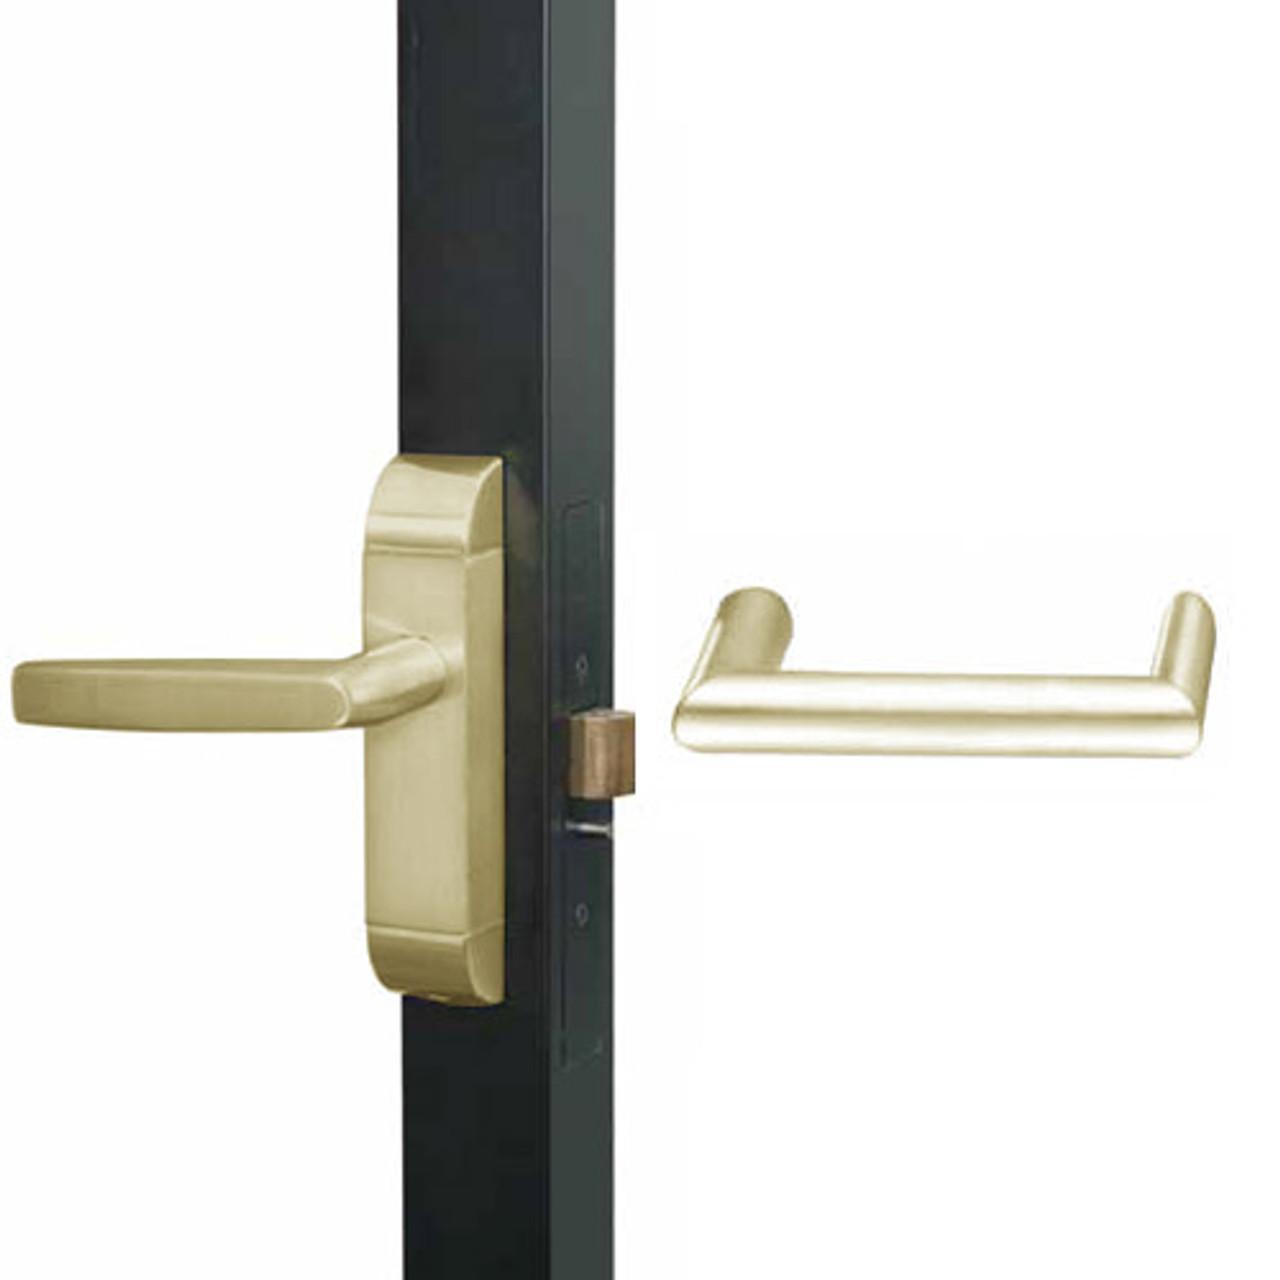 4600M-MW-621-US4 Adams Rite MW Designer Deadlatch handle in Satin Brass Finish